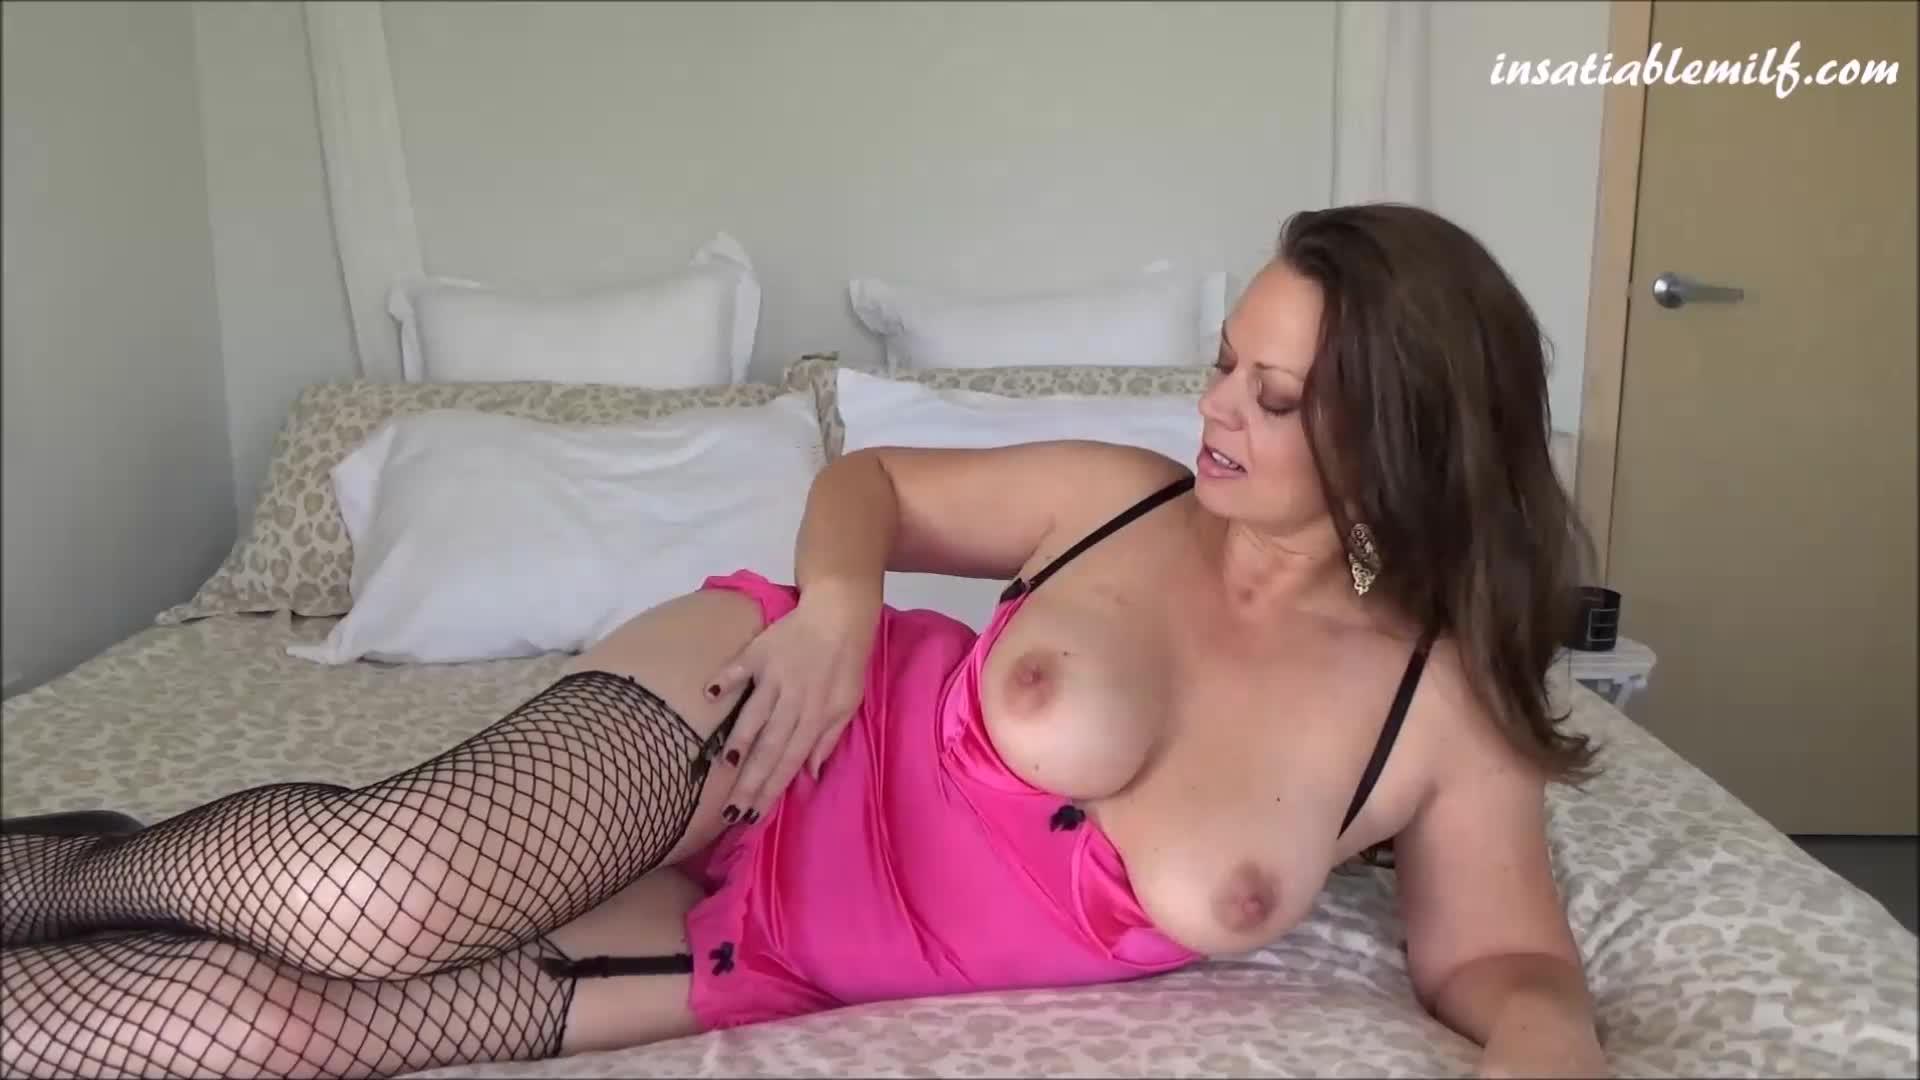 Tinder slut cock review